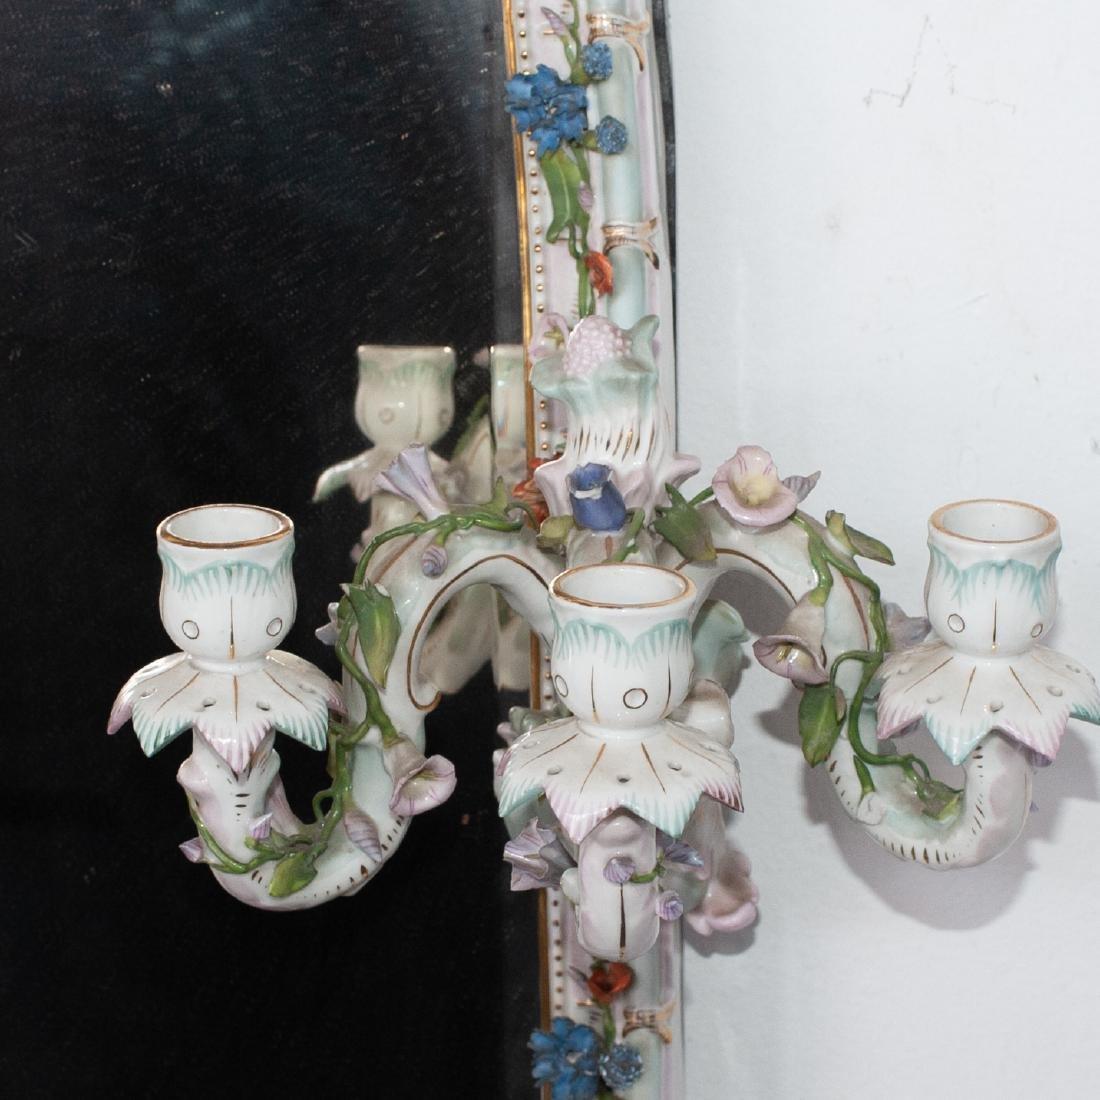 German Porcelain Mirror Sconce - 3